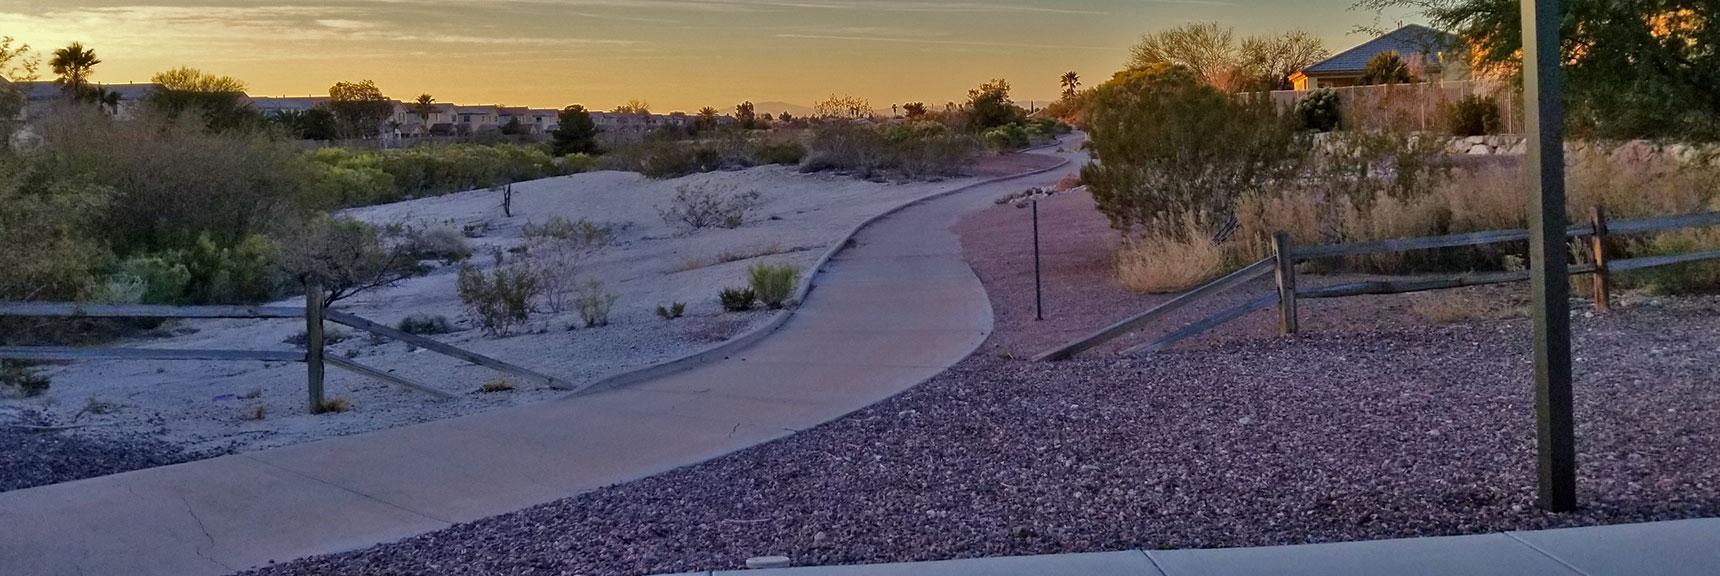 Environmental Consciousness in Las Vegas, Nevada, Slide 002